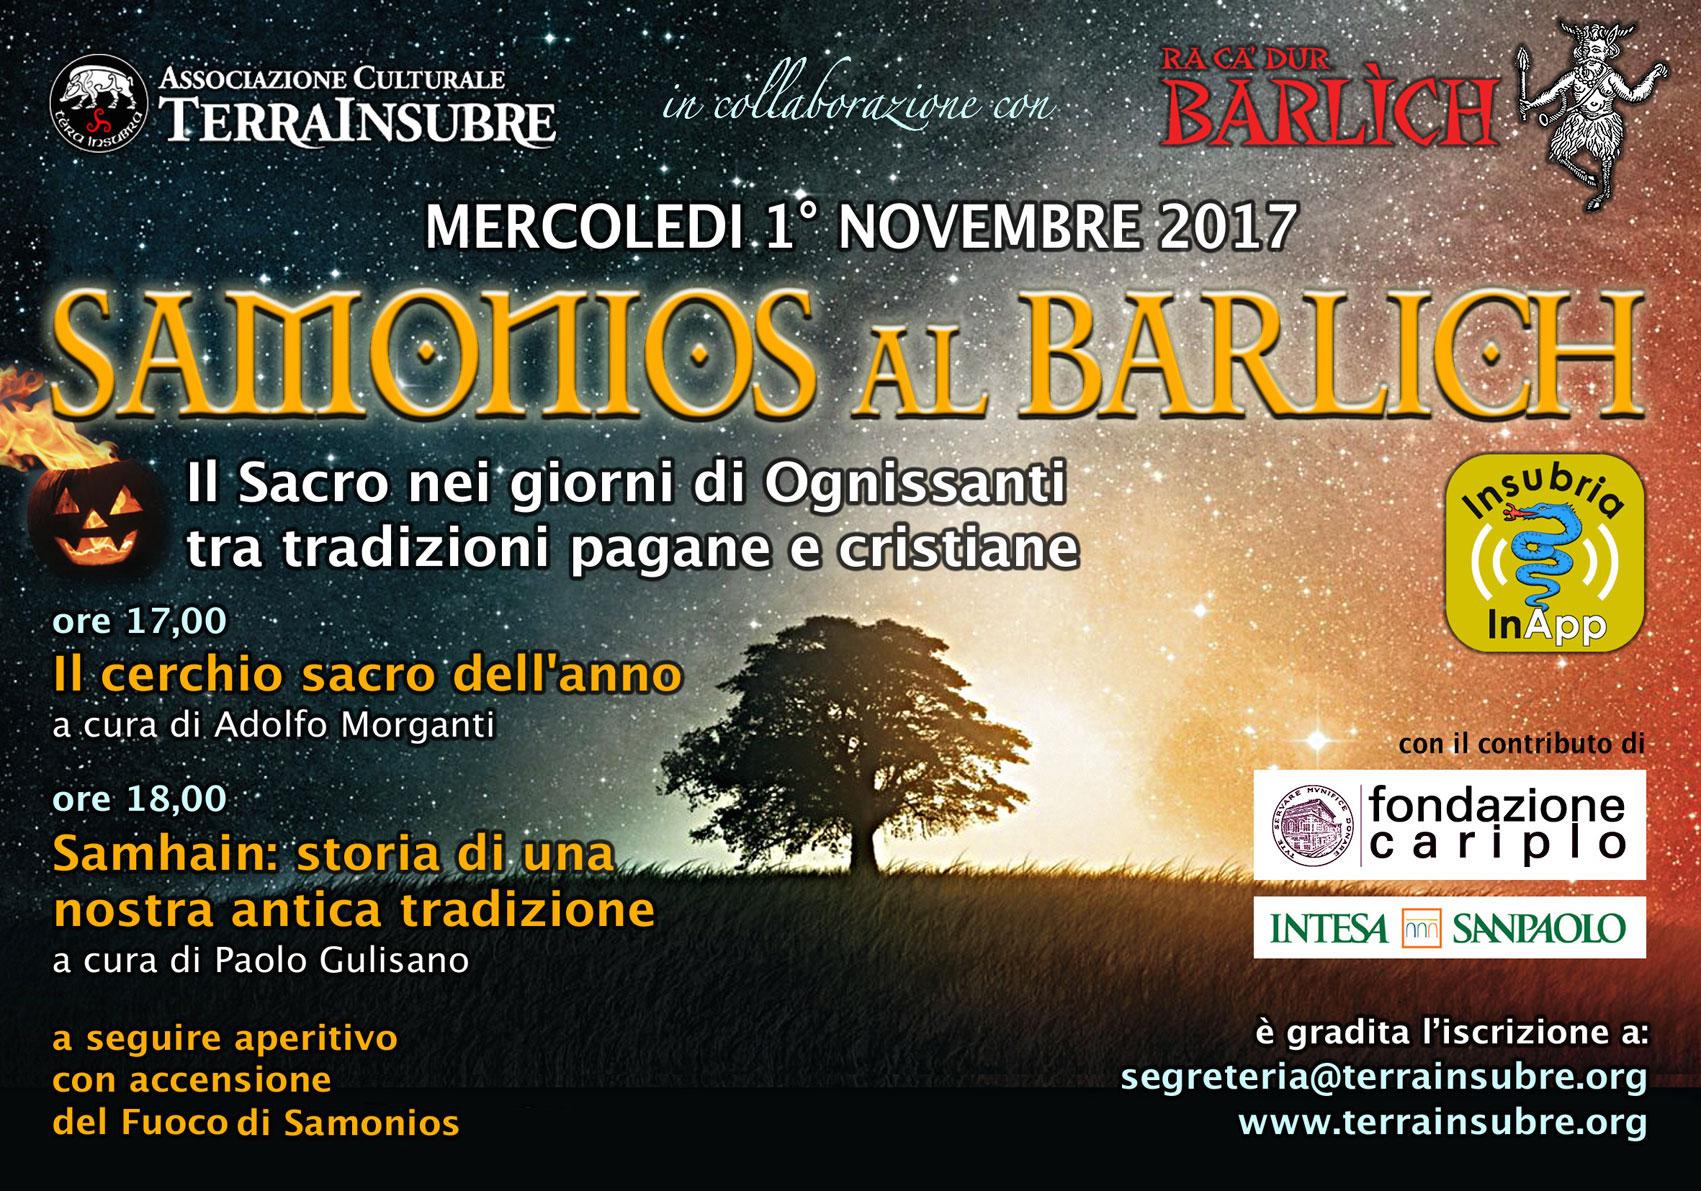 SAMONIOS AL BARLICH DI VARESE MERCOLEDÌ 1° NOVEMBRE 2017 samonios 2017